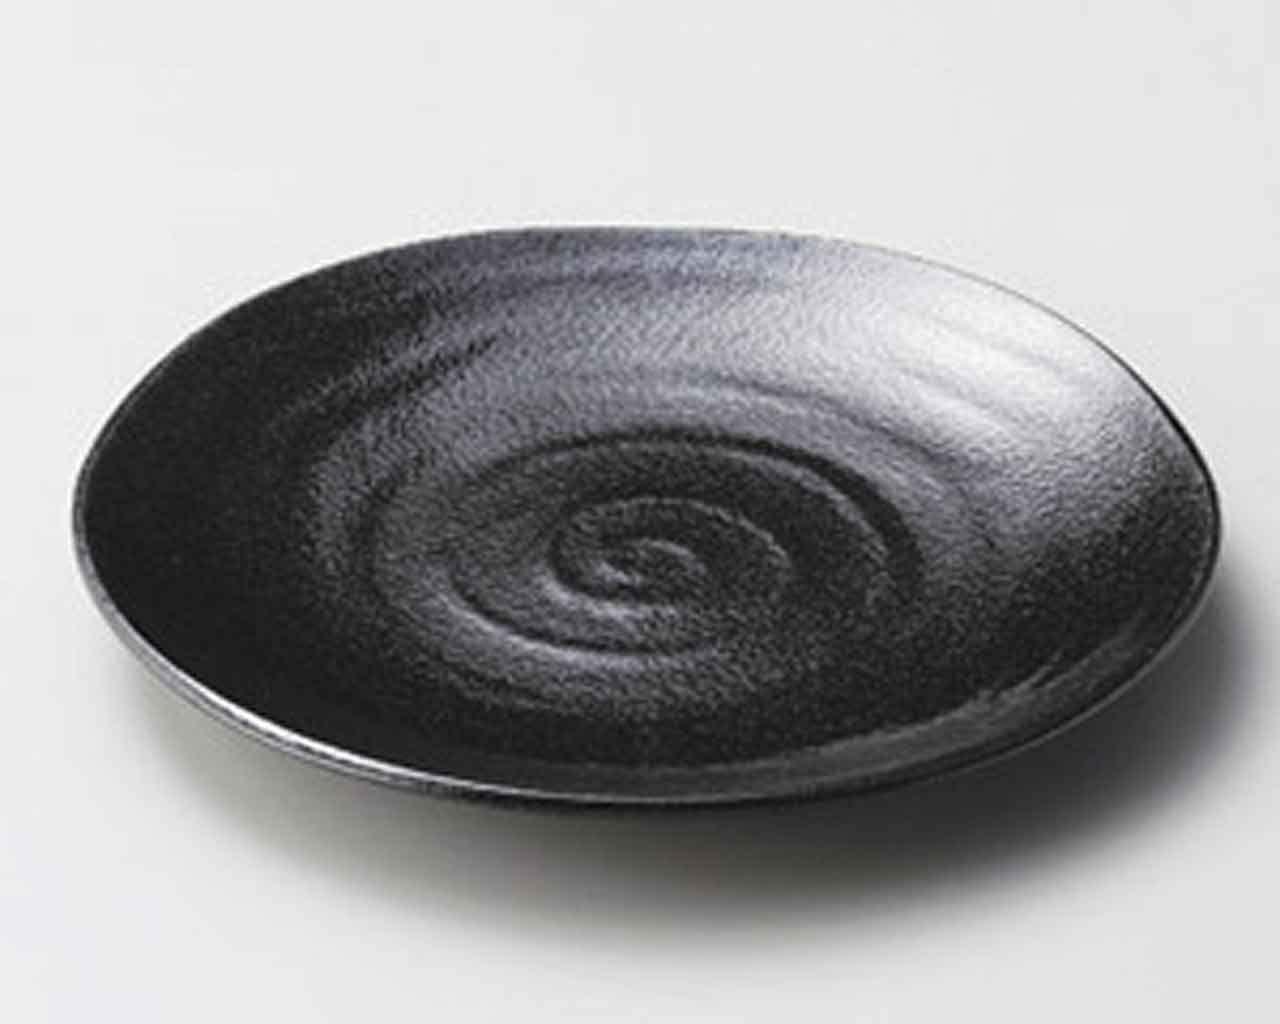 Voltex 9.8inch Set of 2 SUSHI PLATES Black porcelain Made in Japan